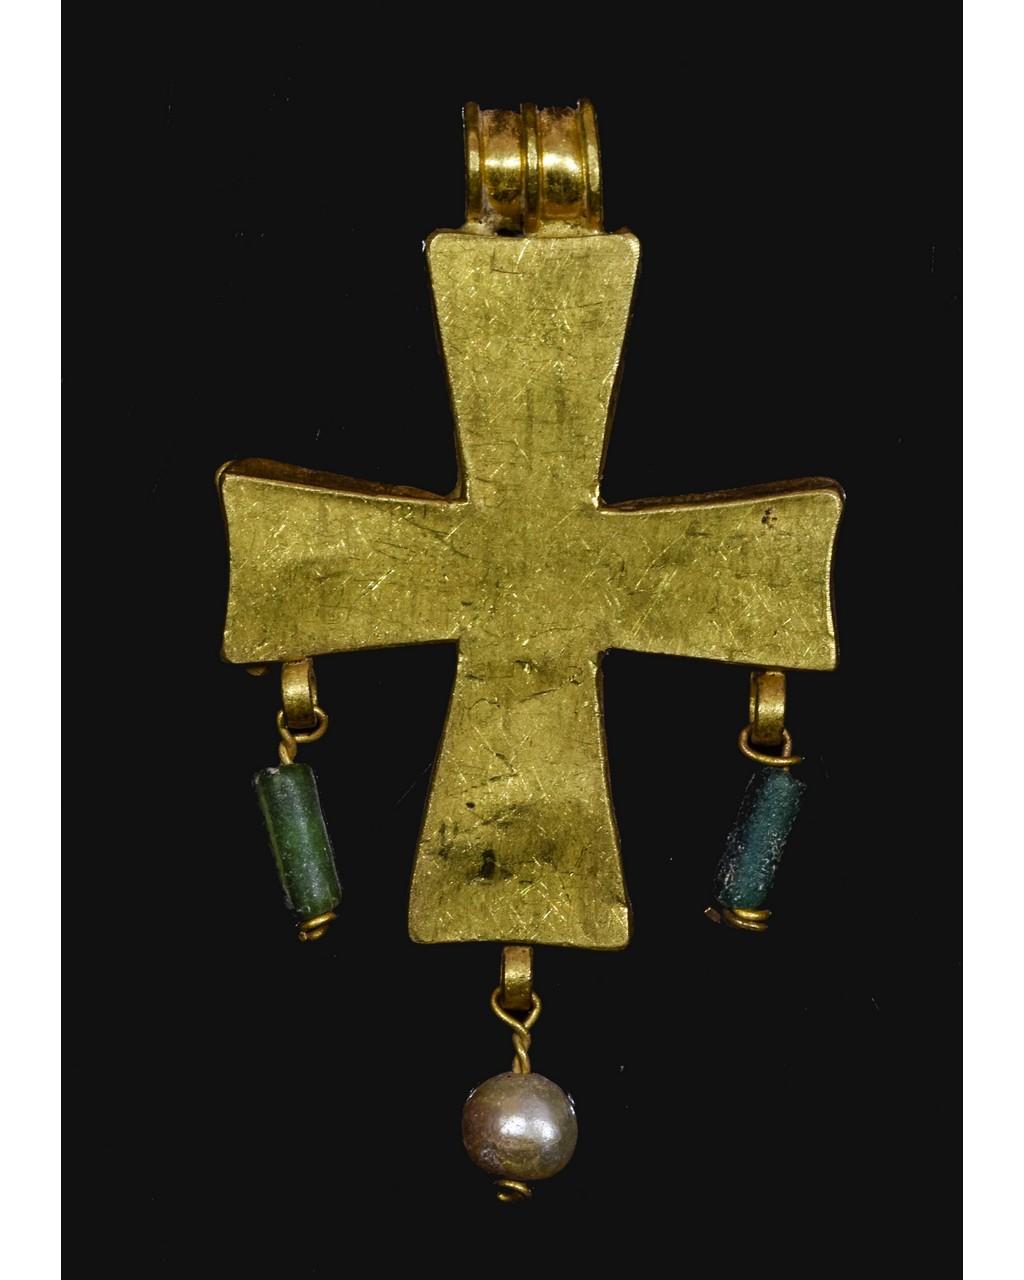 Lot 29 - BYZANTINE GOLD CROSS WITH GARNETS - RARE